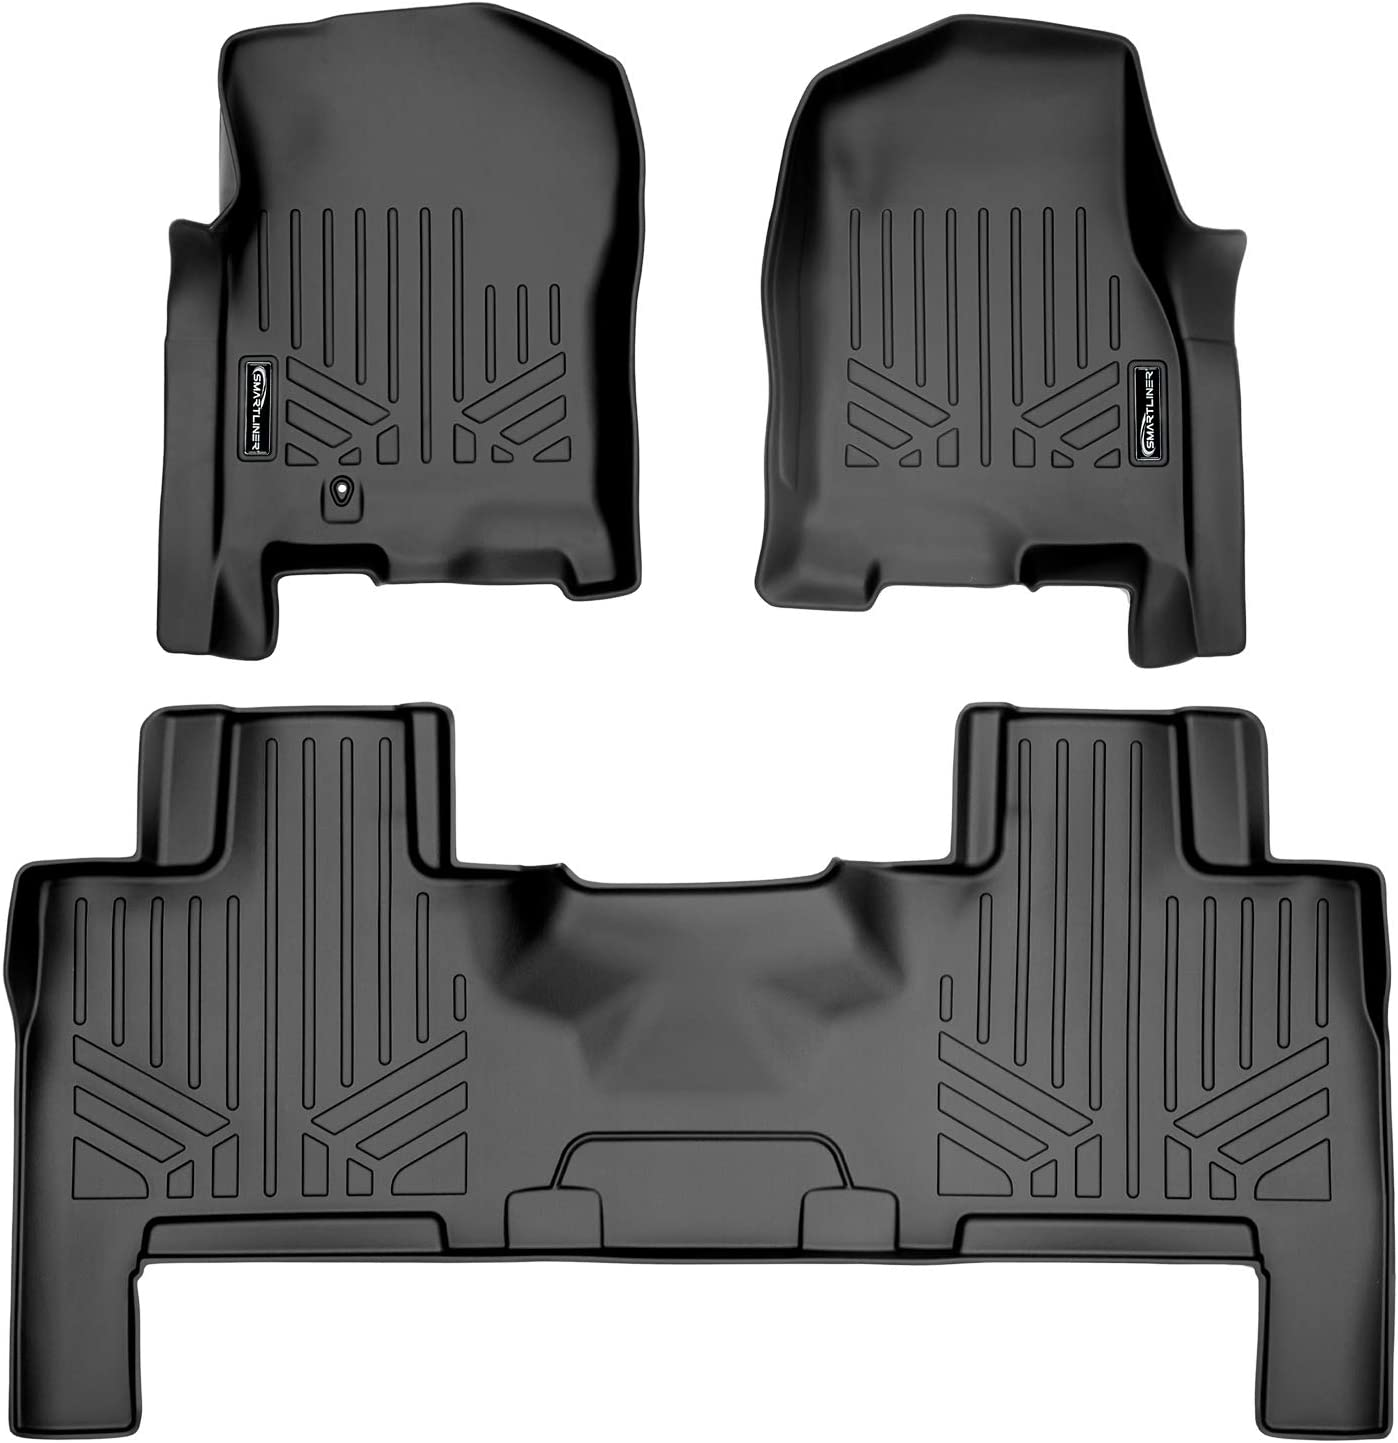 MAXLINER Floor Mats 2 Row Liner Set Black for 2007-2010 Ford Expedition/Lincoln Navigator (All Models Including EL and L)